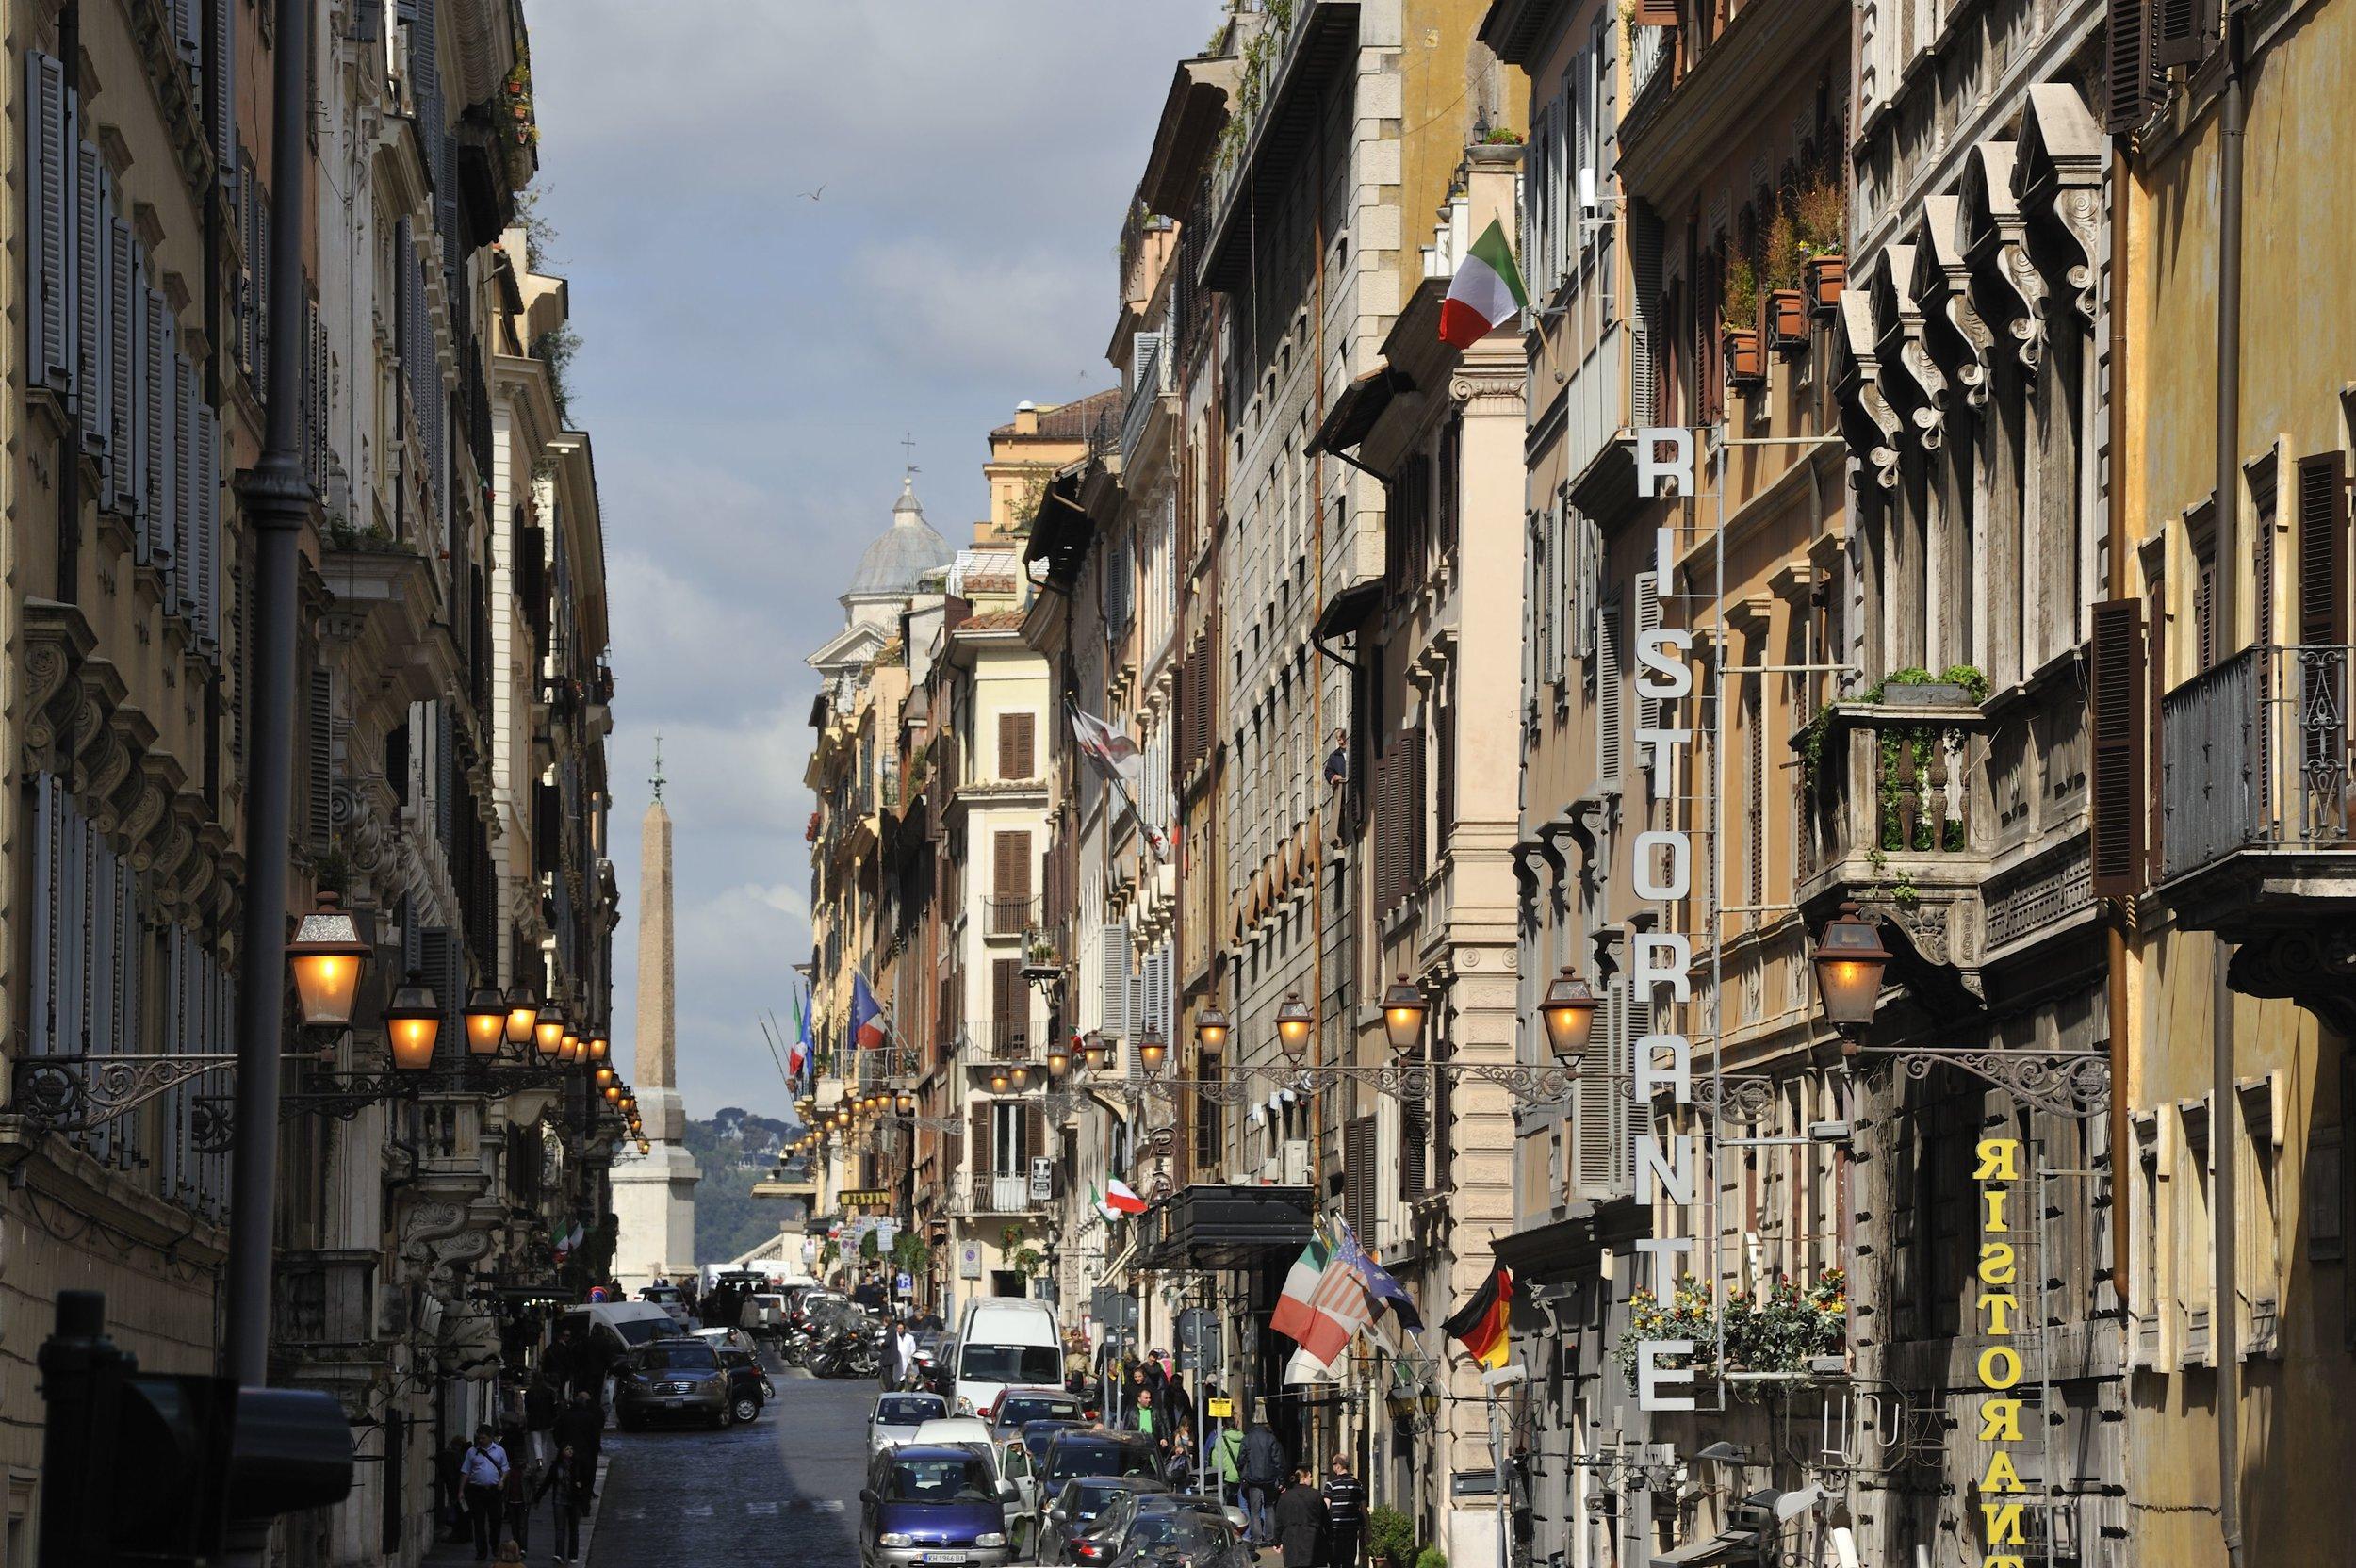 Via Sistina, Roma